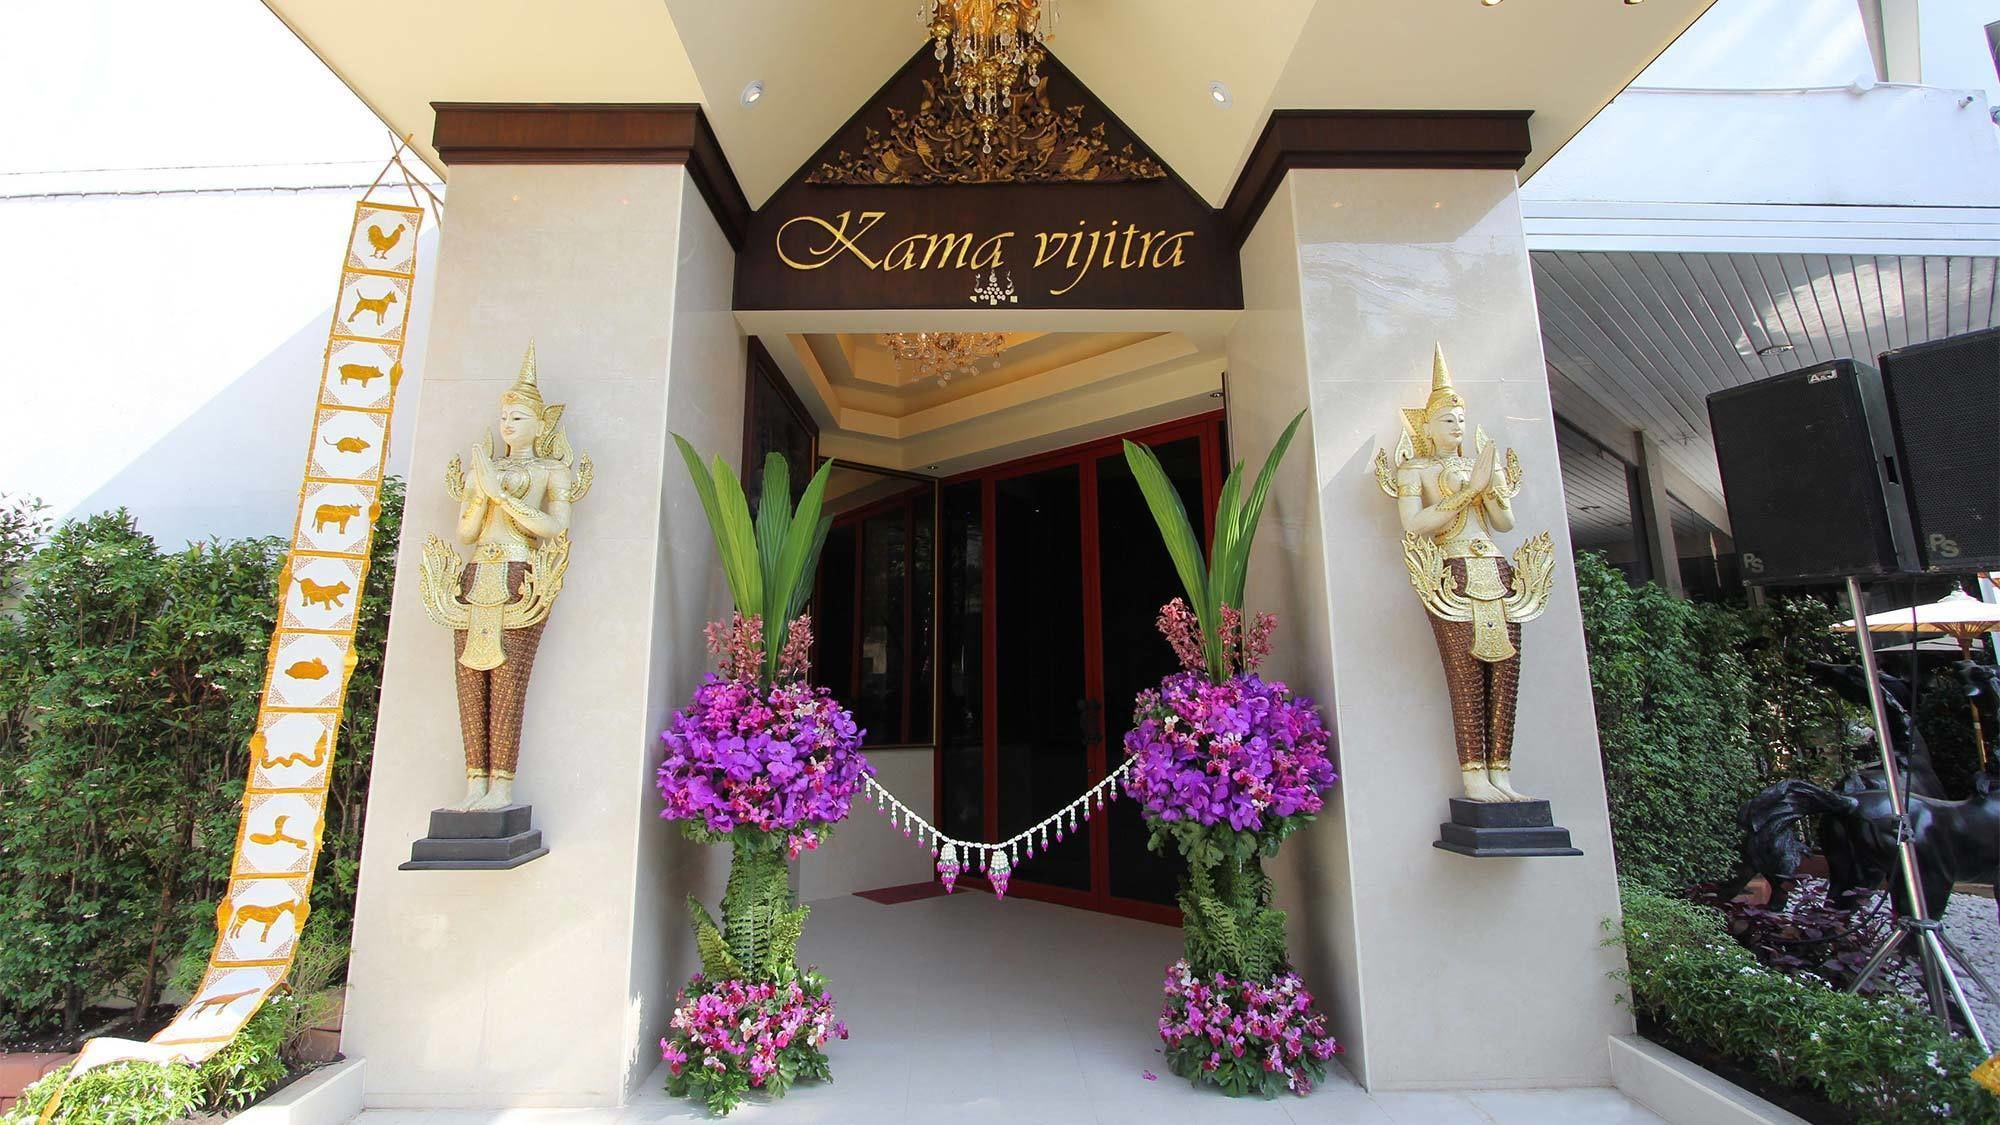 View in front of the Kamavijitra Museum in Bangkok, Thailand